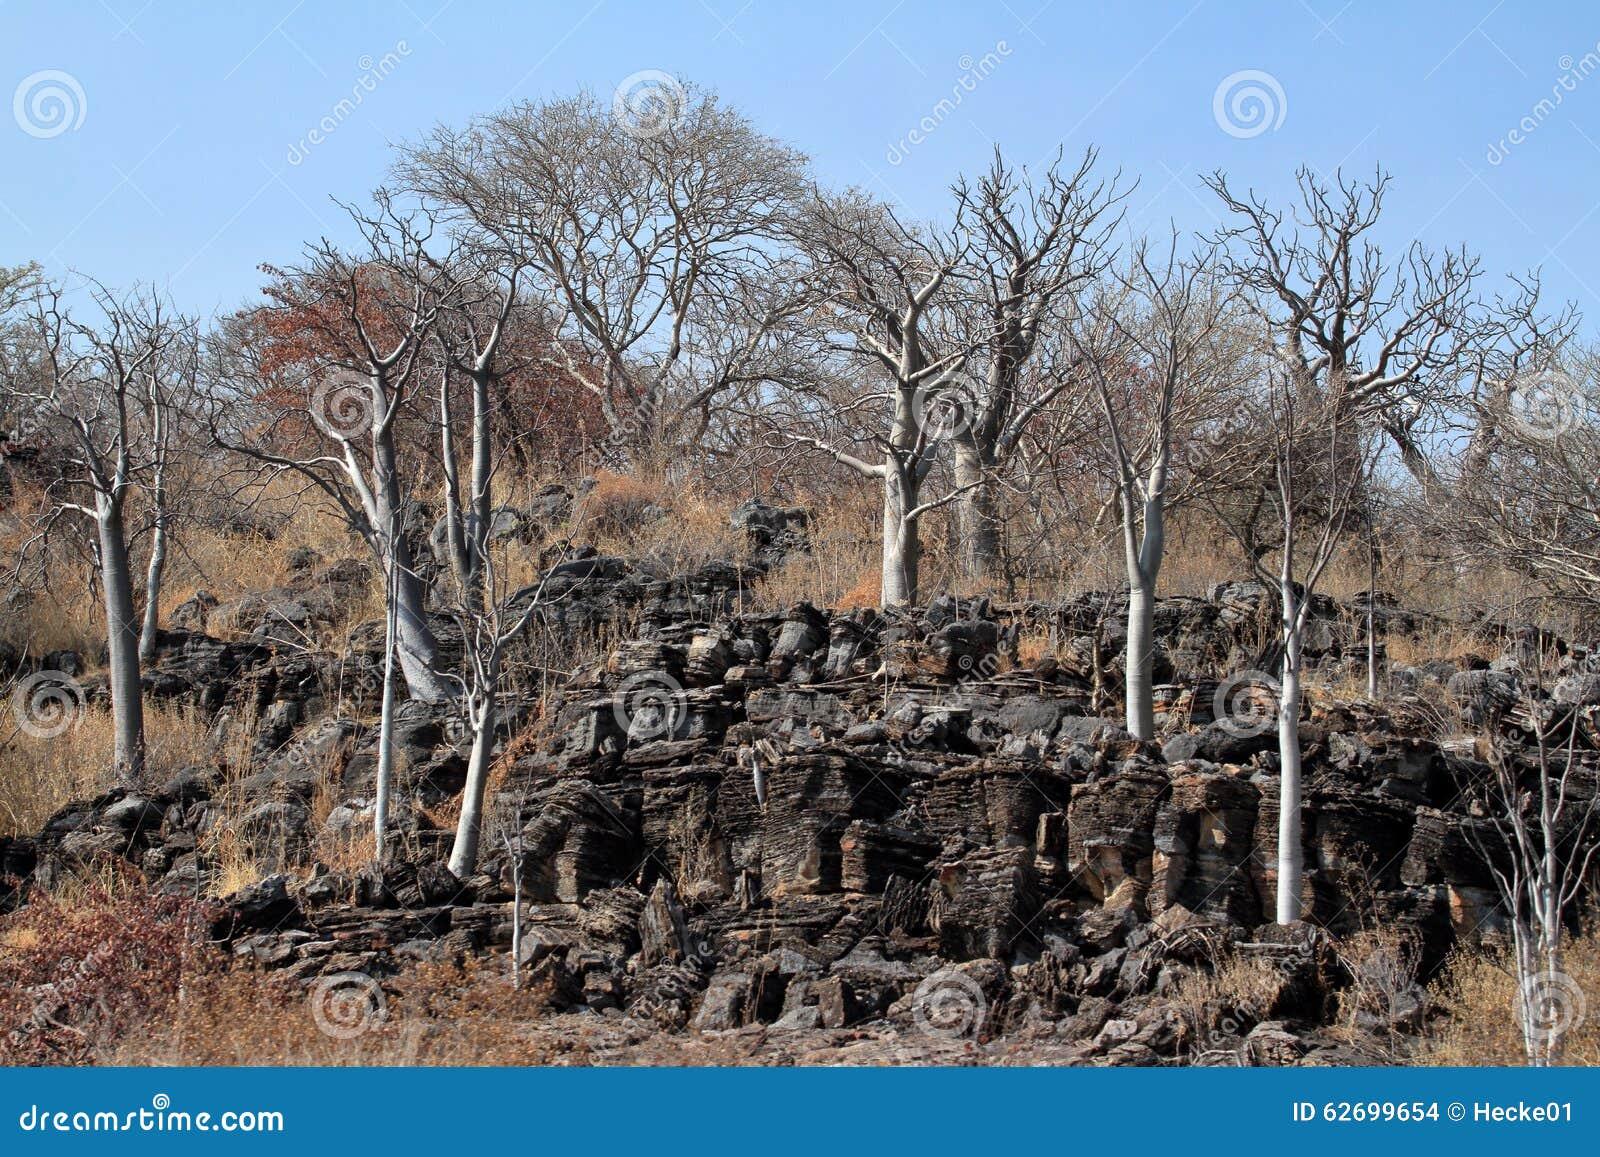 Baobab trees in the african savannah stock photo image for Landscaping rocks savannah ga